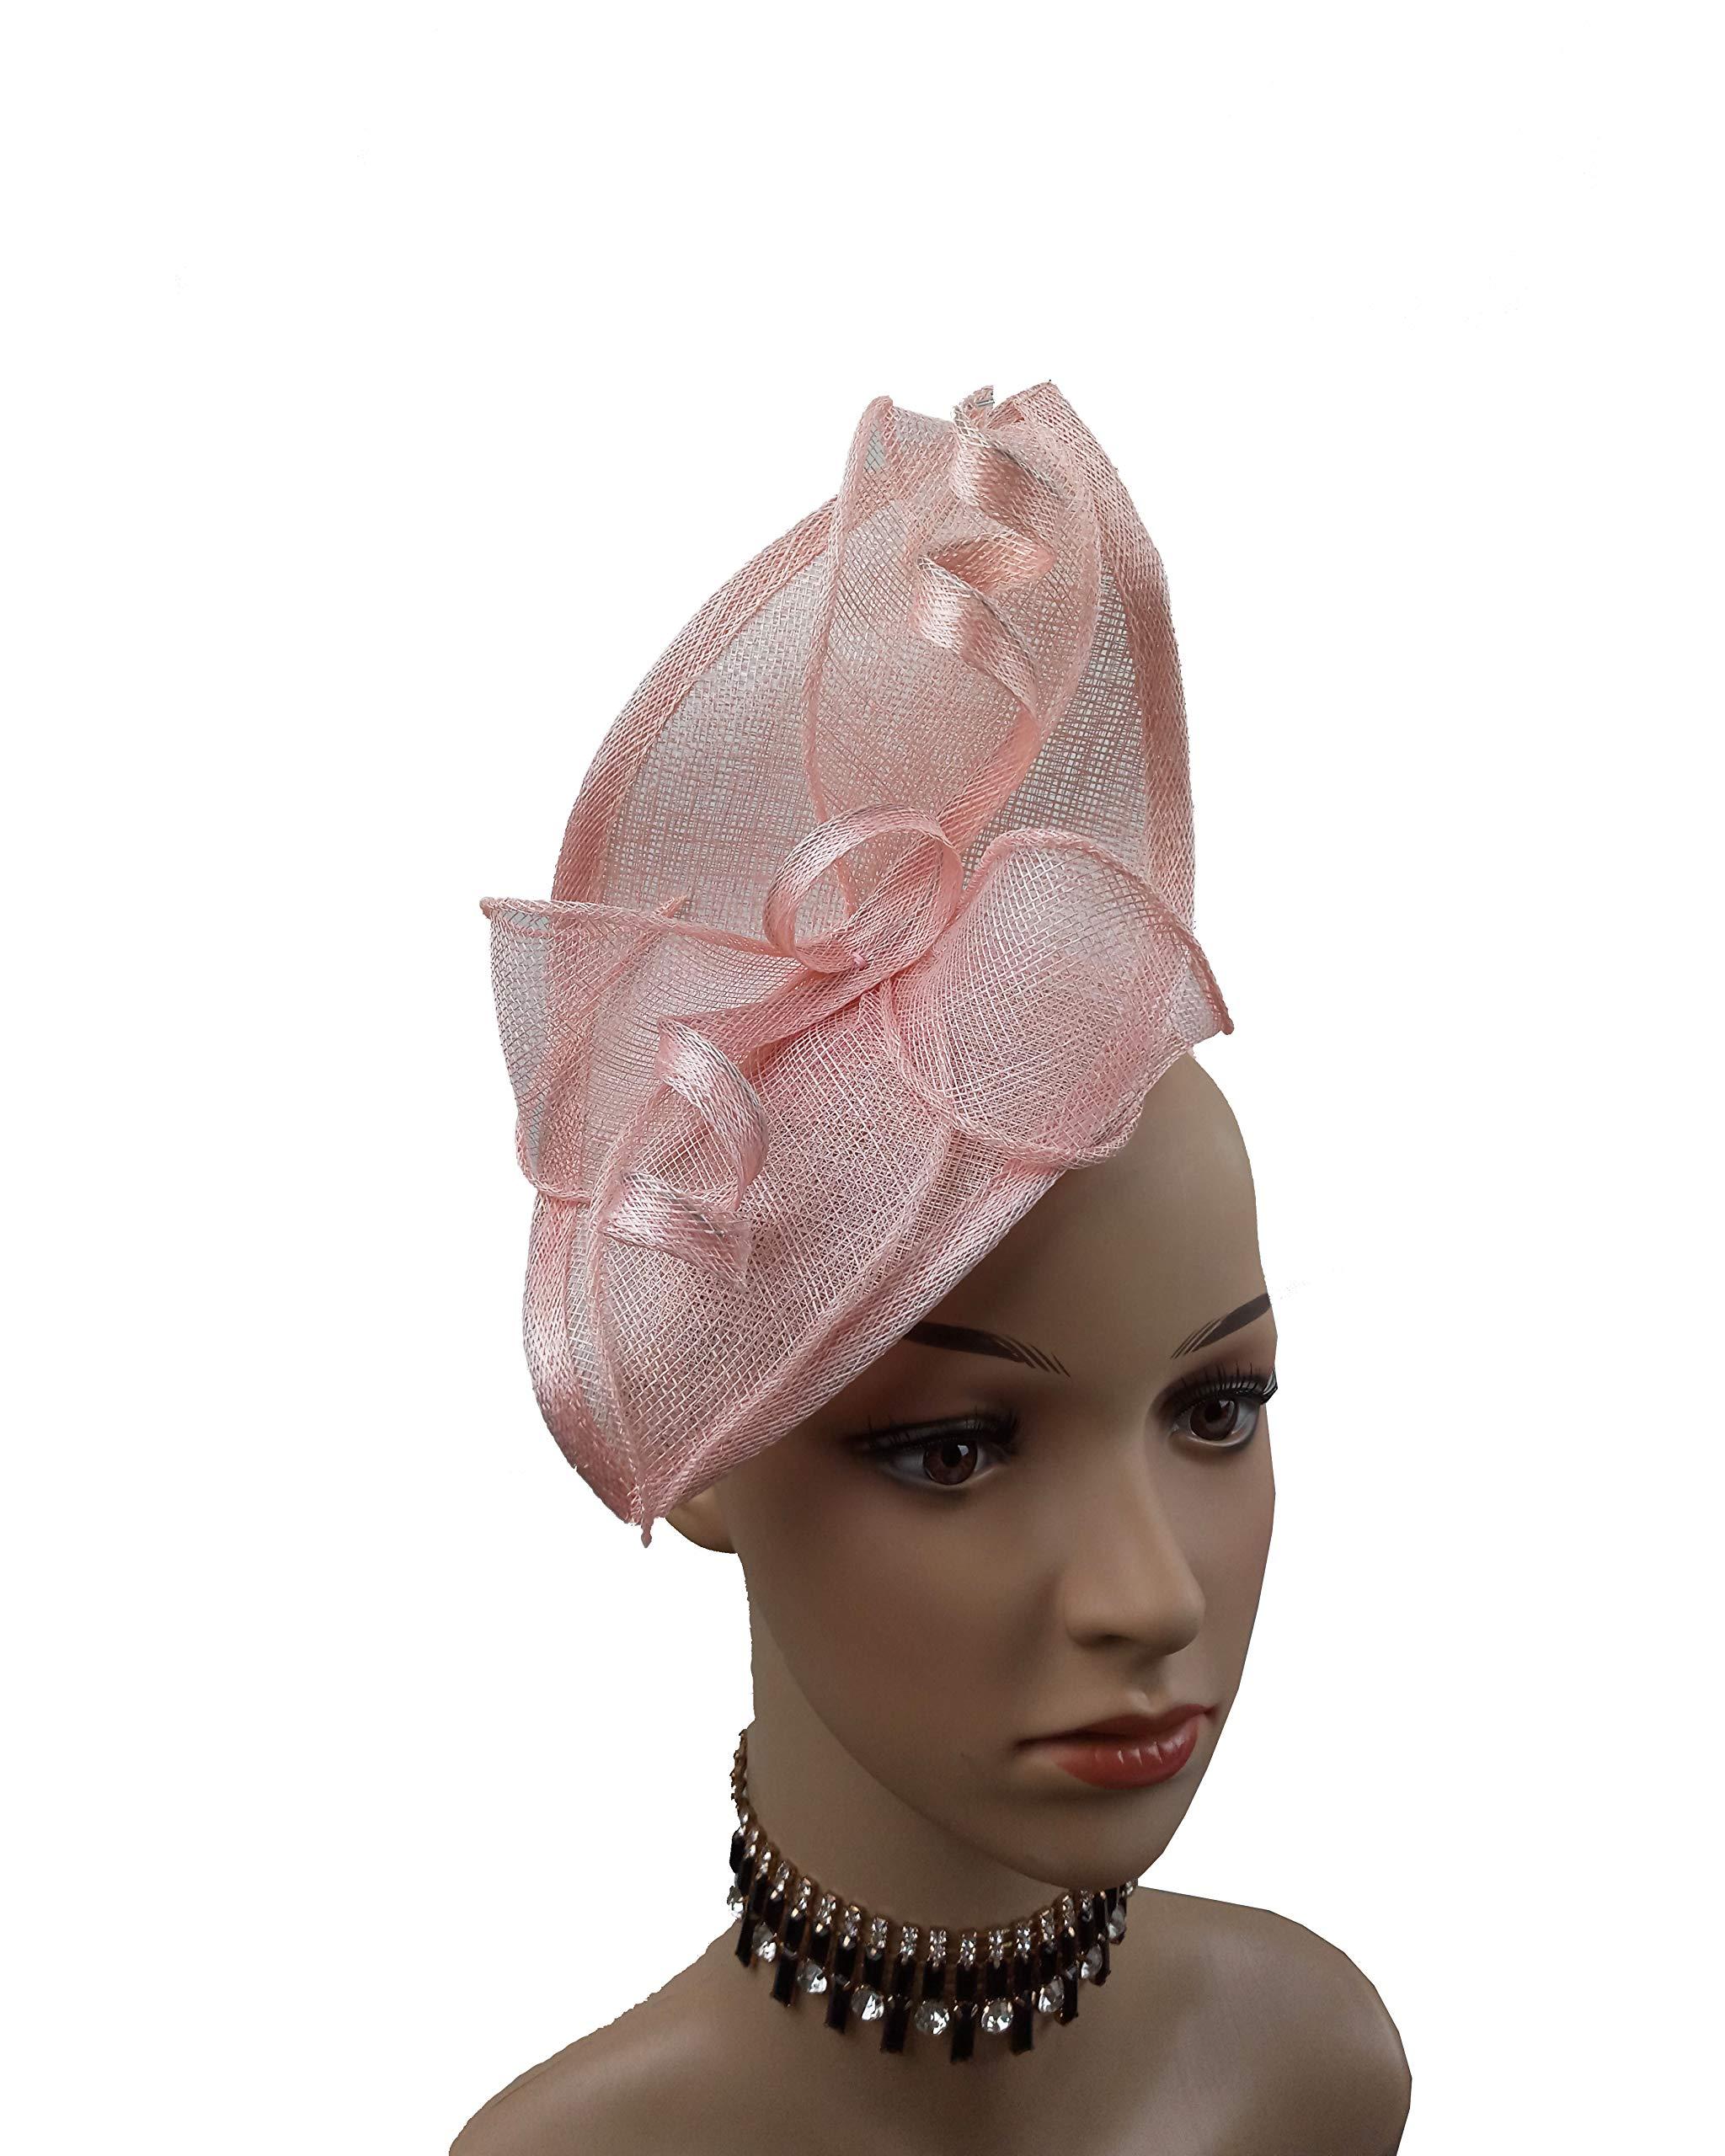 ABPF Sinamay Teardrop Fascinators Headband Hats Derby Racing Hat (Peach Pink) by ABPF (Image #2)